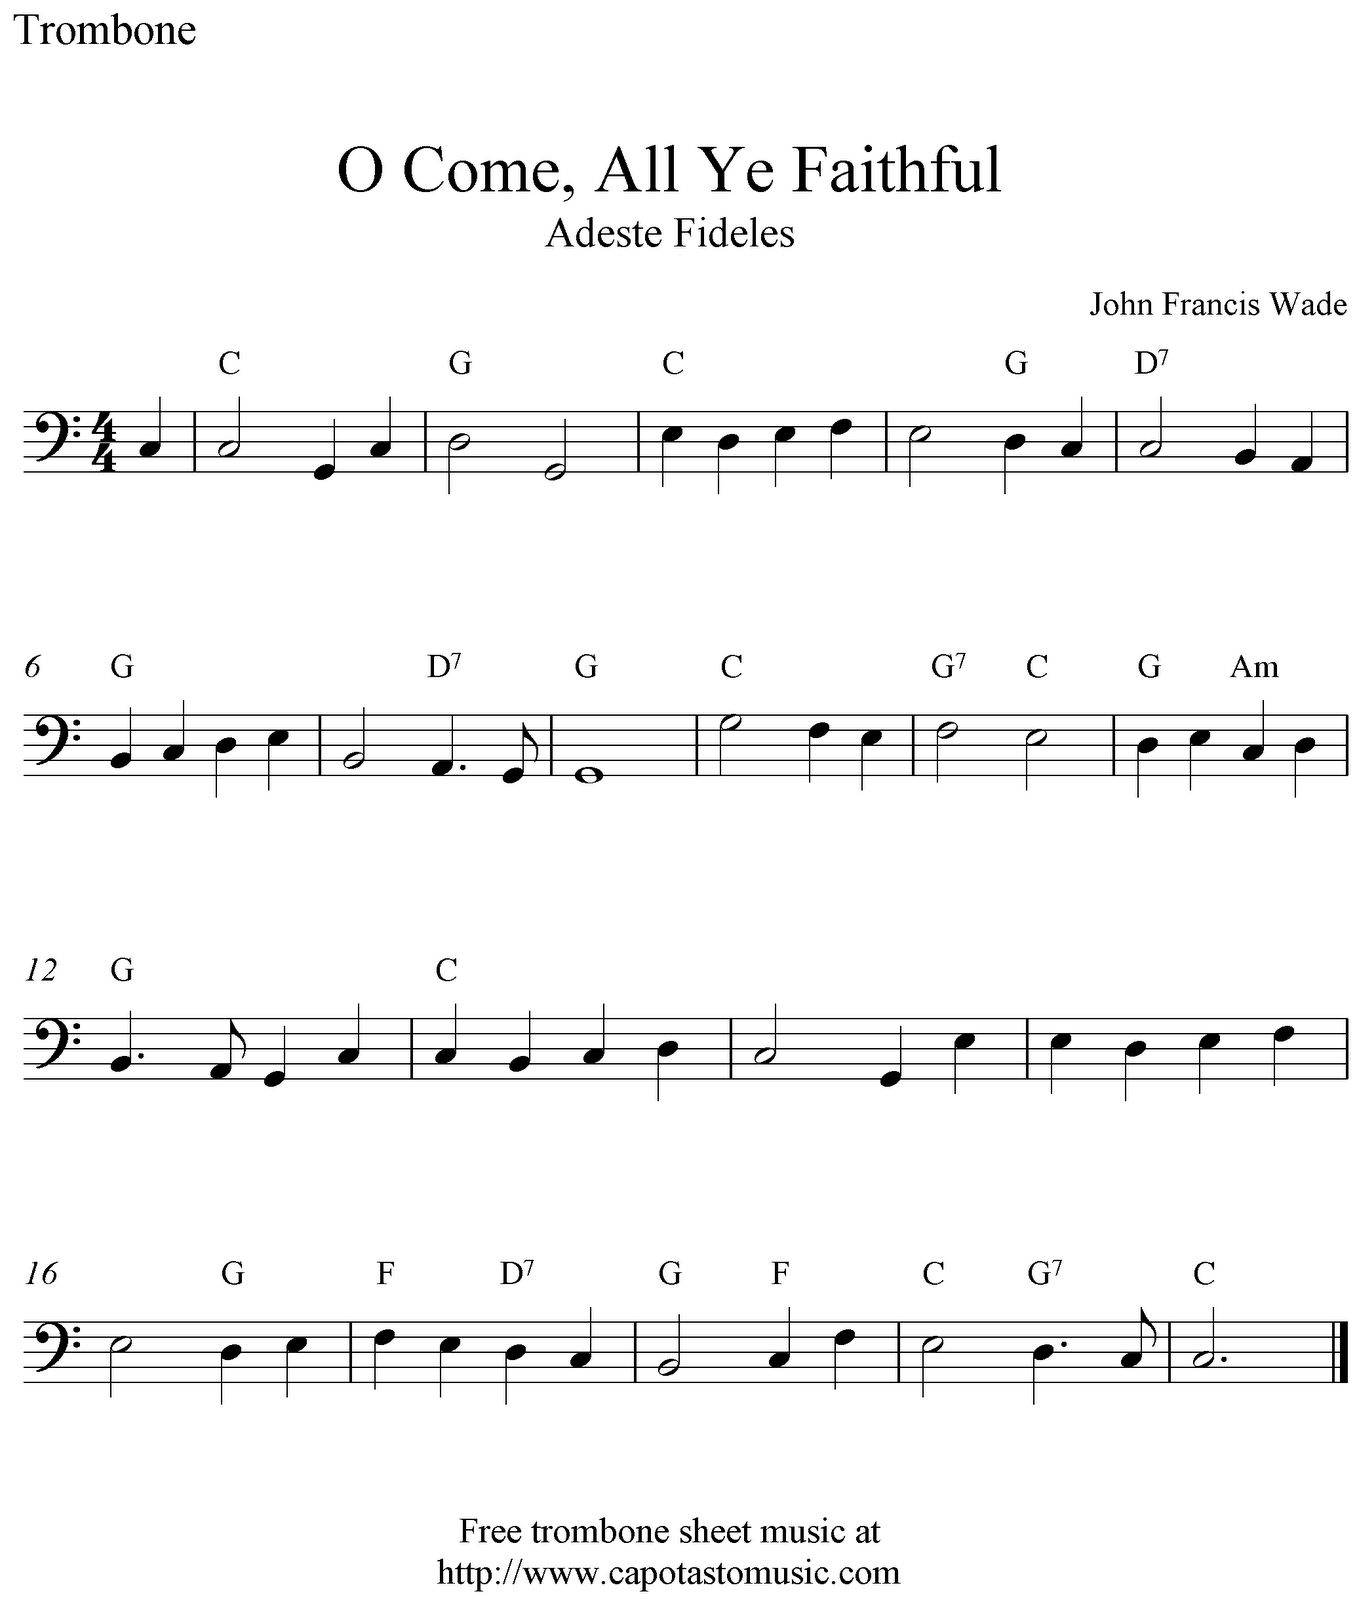 O Come, All Ye Faithful, Simple Music For Trombone. | Music & Things - Trombone Christmas Sheet Music Free Printable